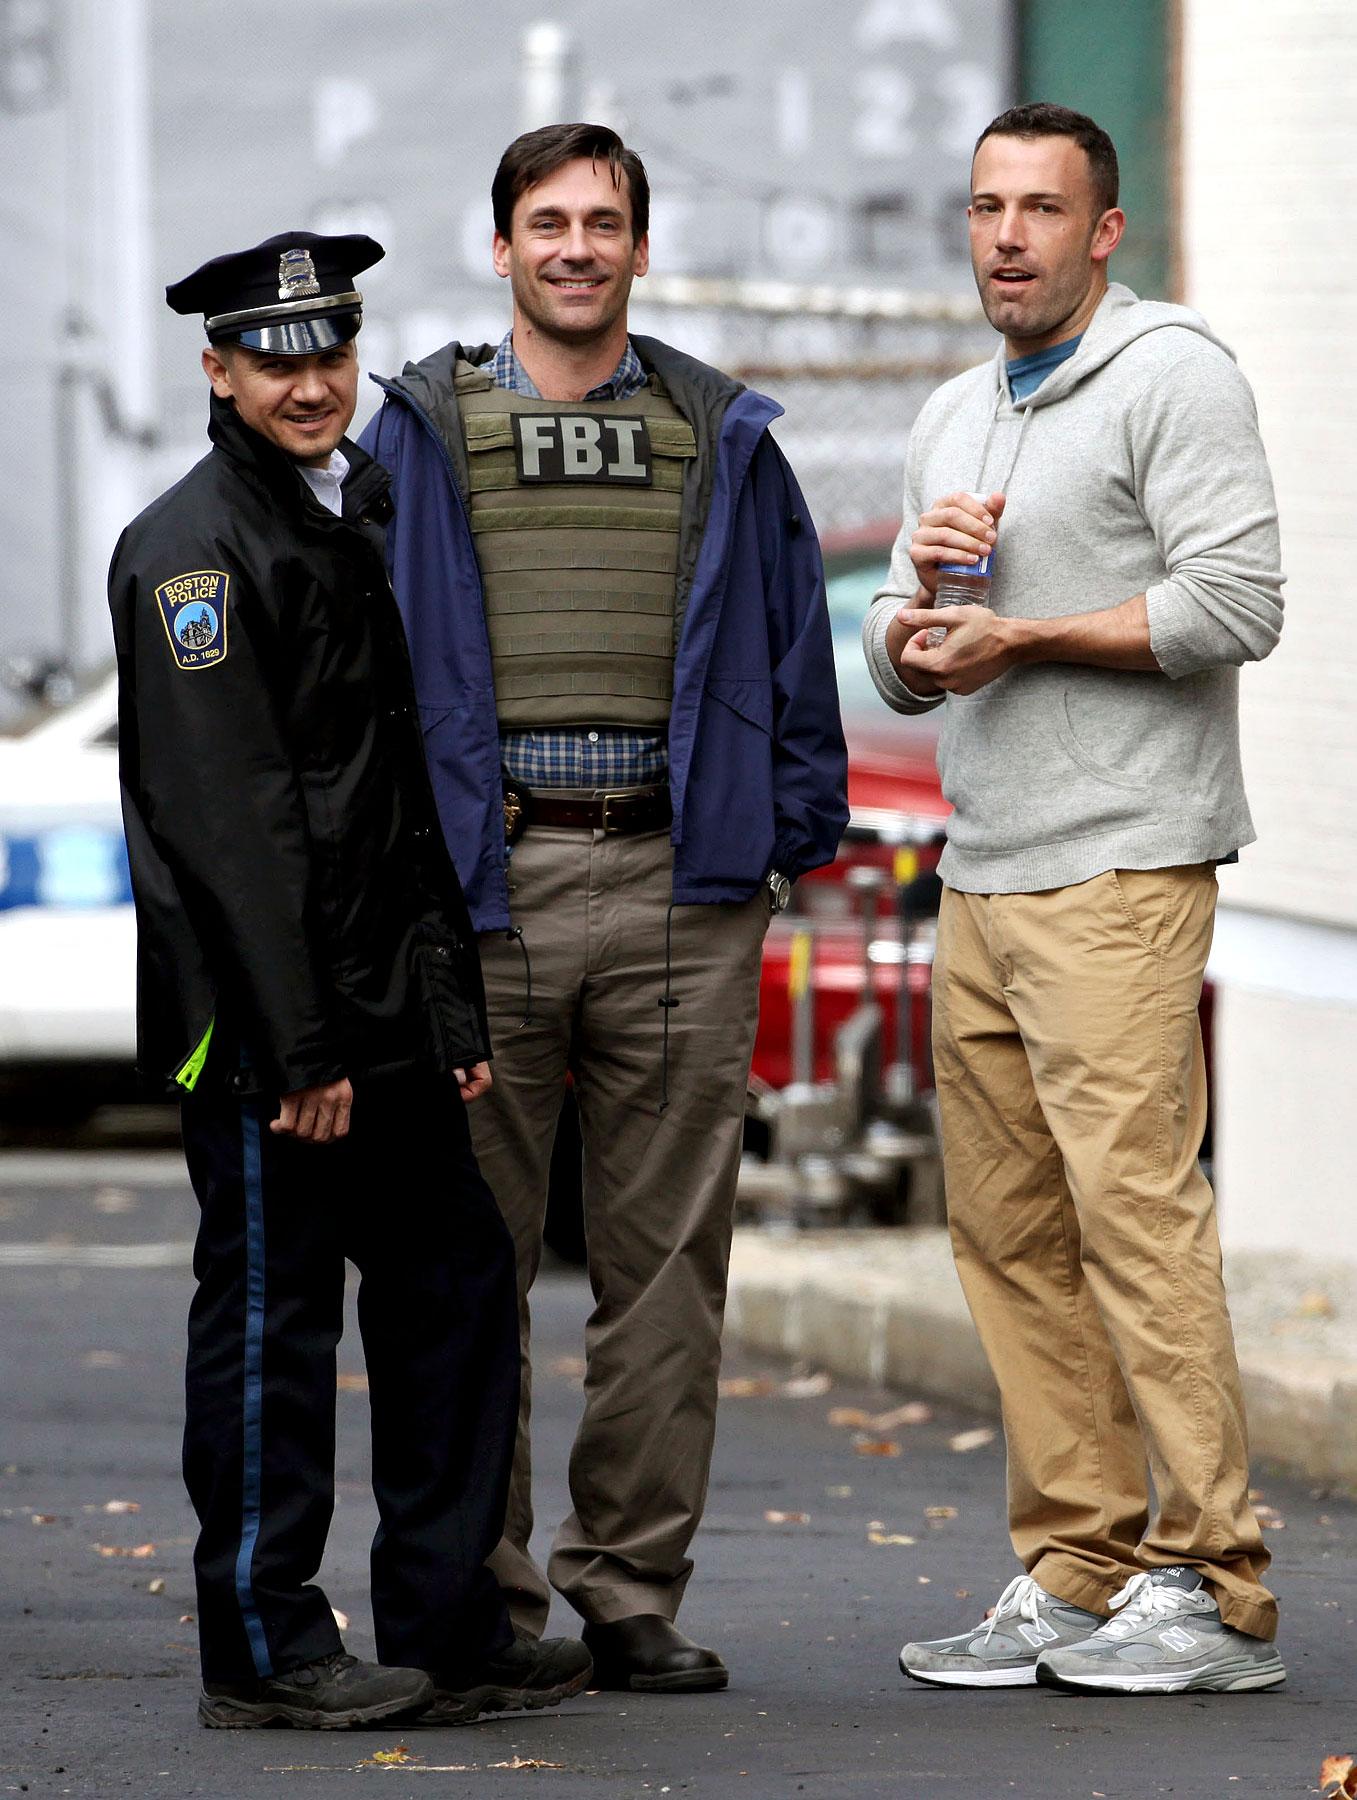 PHOTO GALLERY: Ben Affleck & Jon Hamm Film 'The Town'